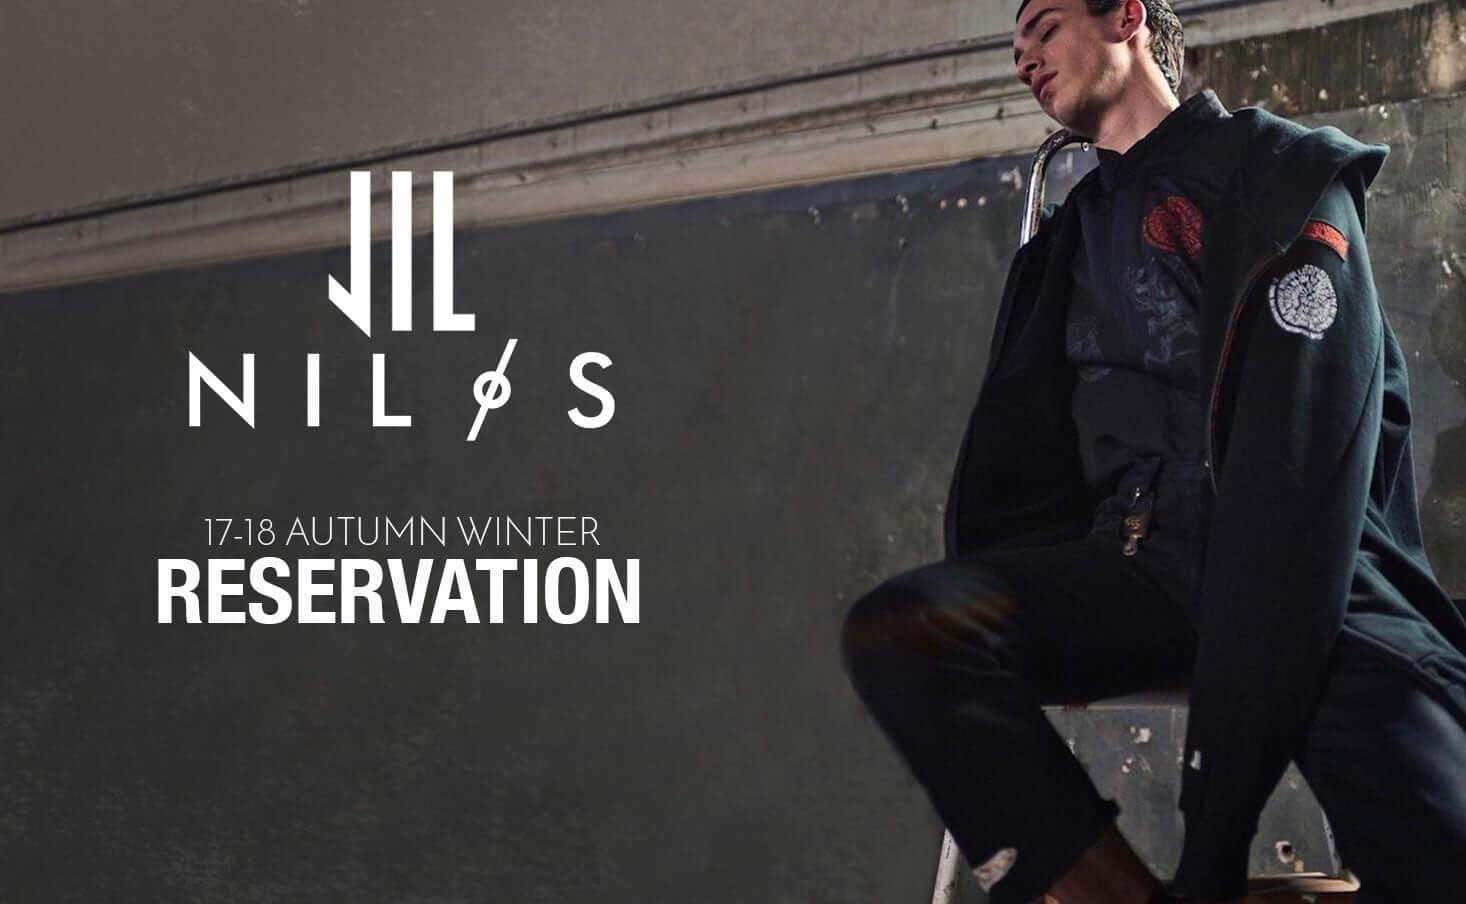 NILøS - ニルズ reservation